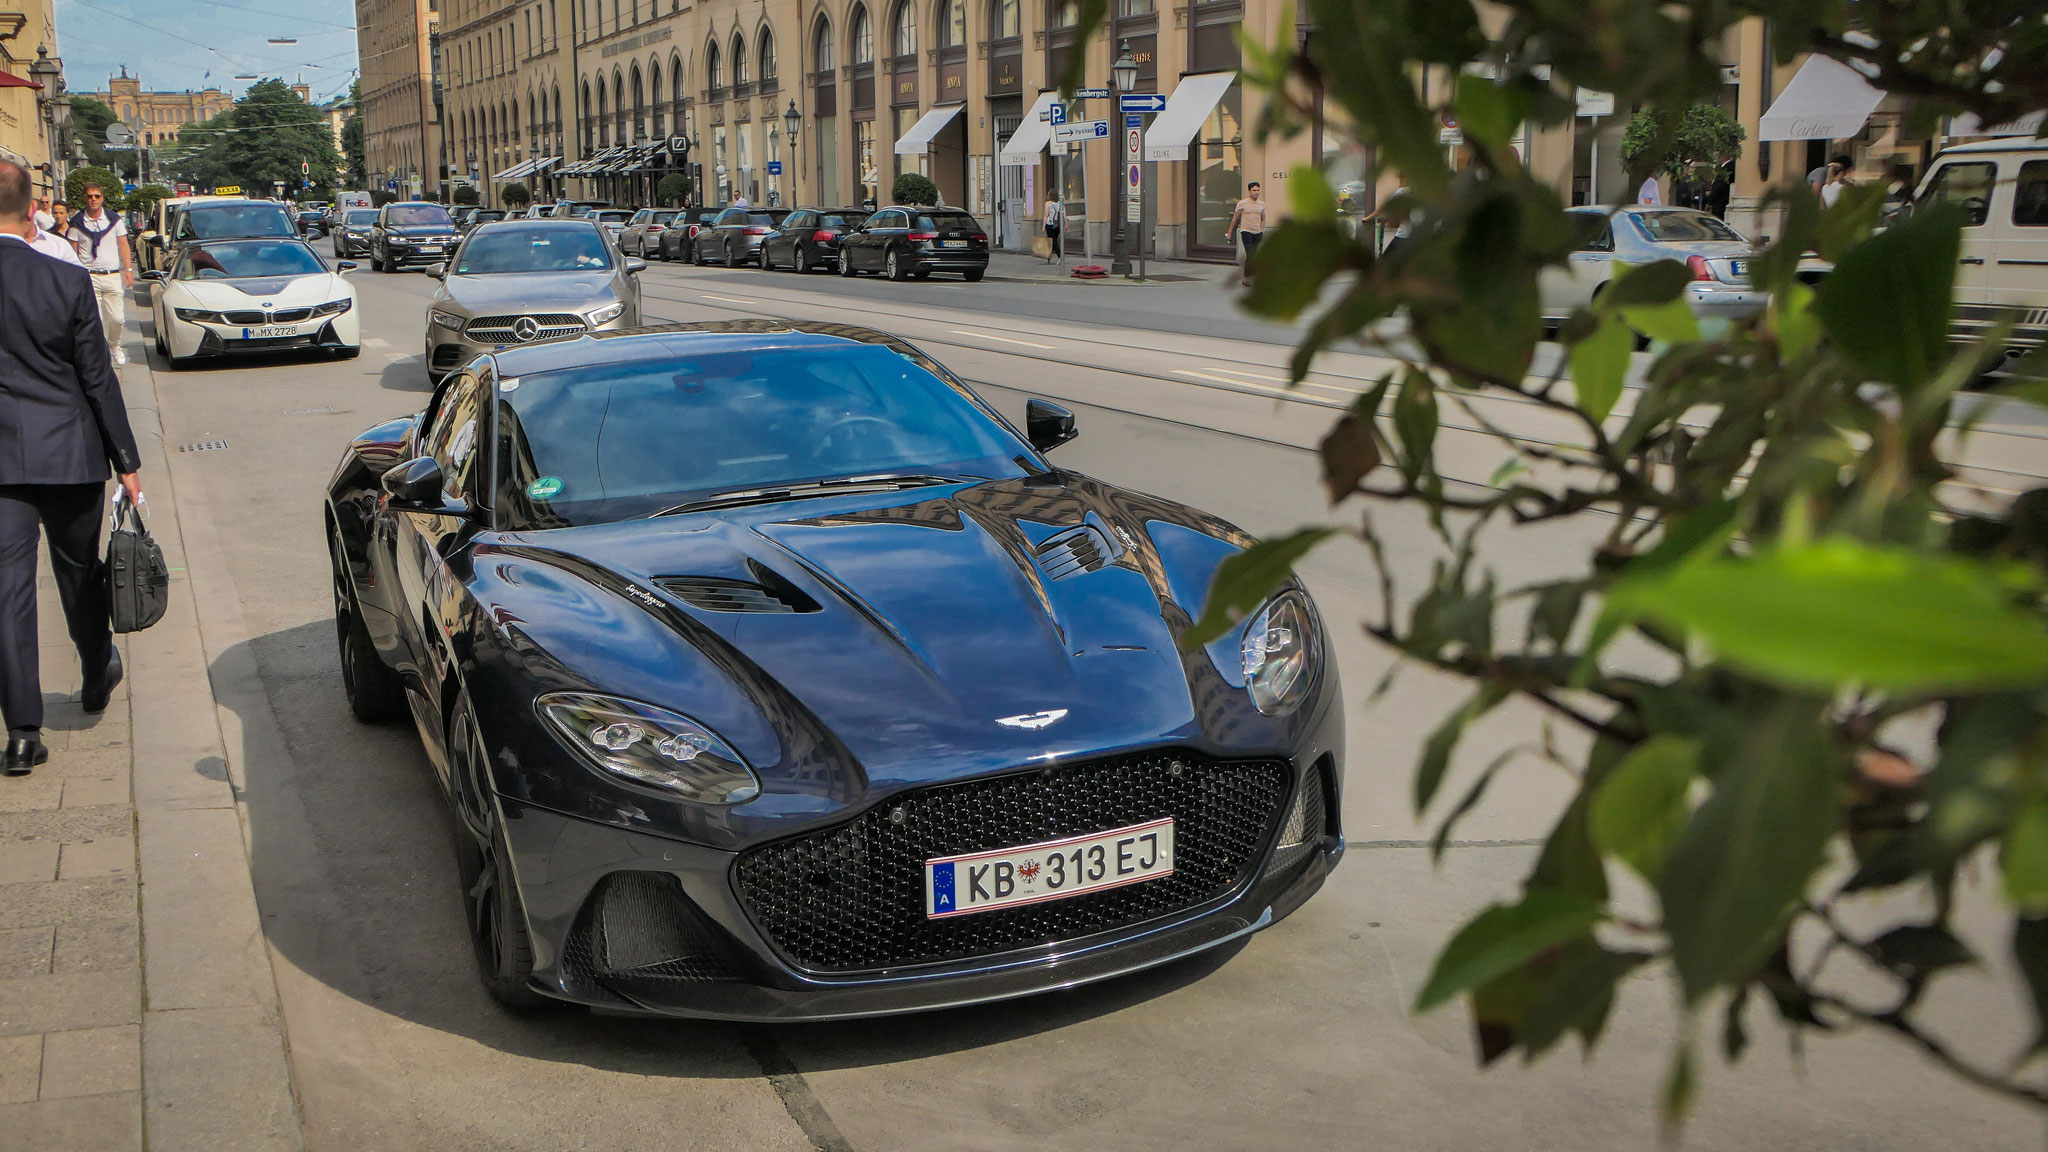 Aston Martin DBS Superleggera - KB-313-EJ (AUT)